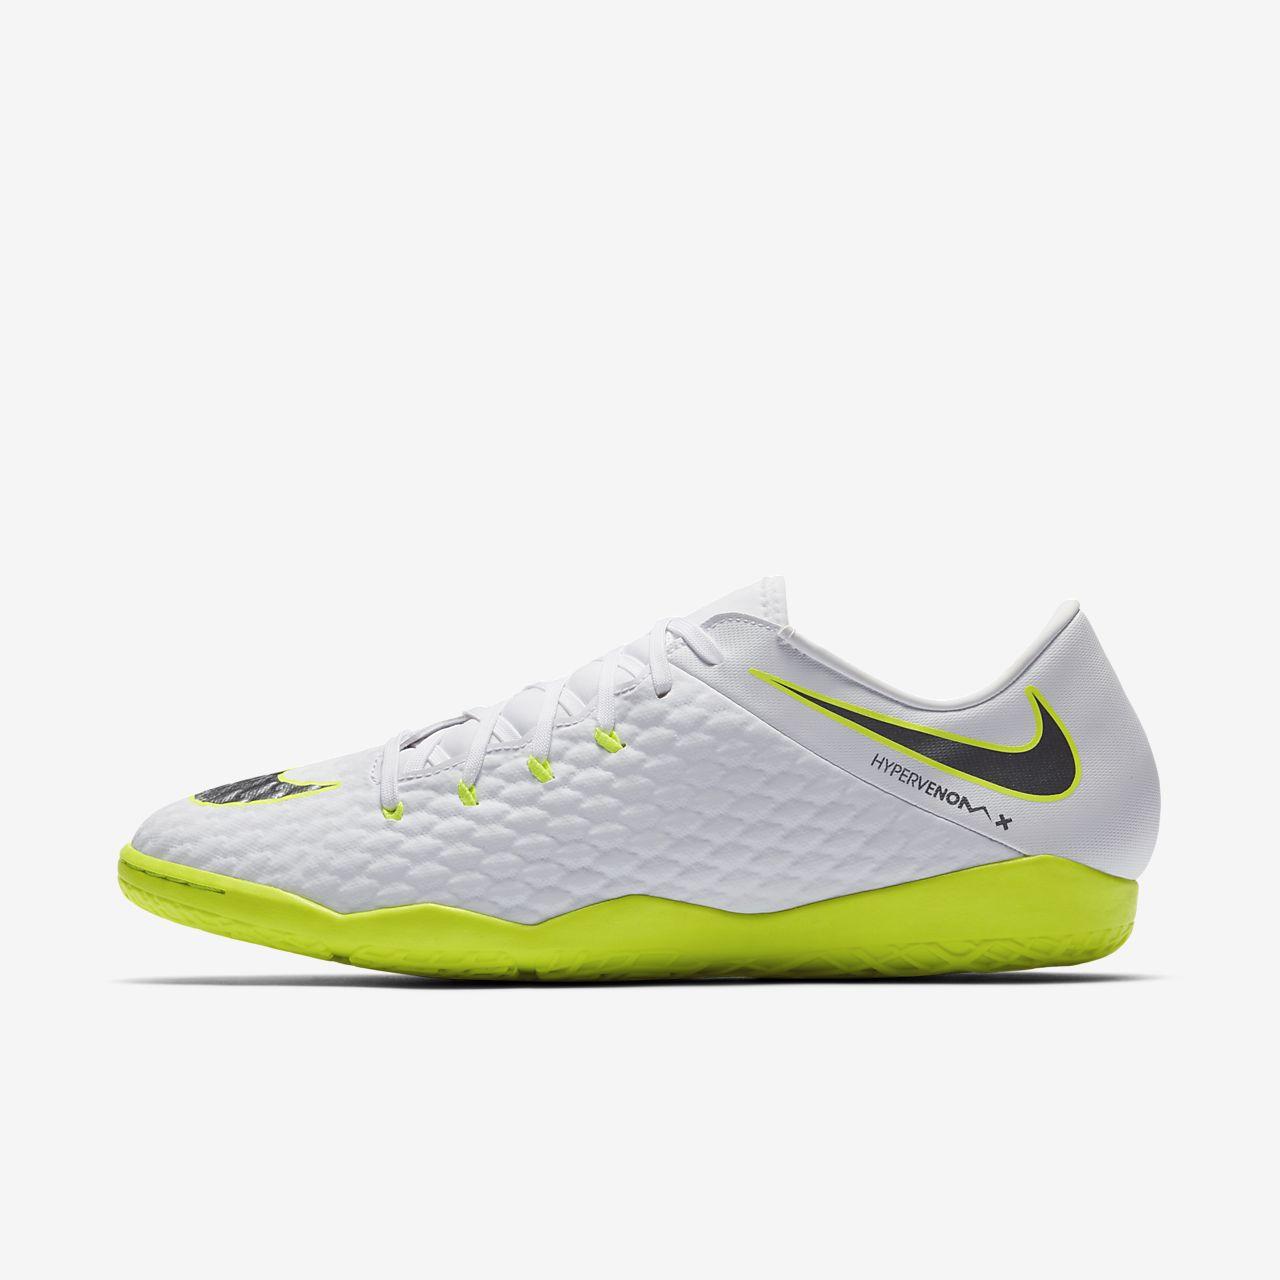 Nike Football Hypervenom Phantomx 3 Indoor Trainers In White AJ3814-107 buy cheap for cheap bvzX9SJ